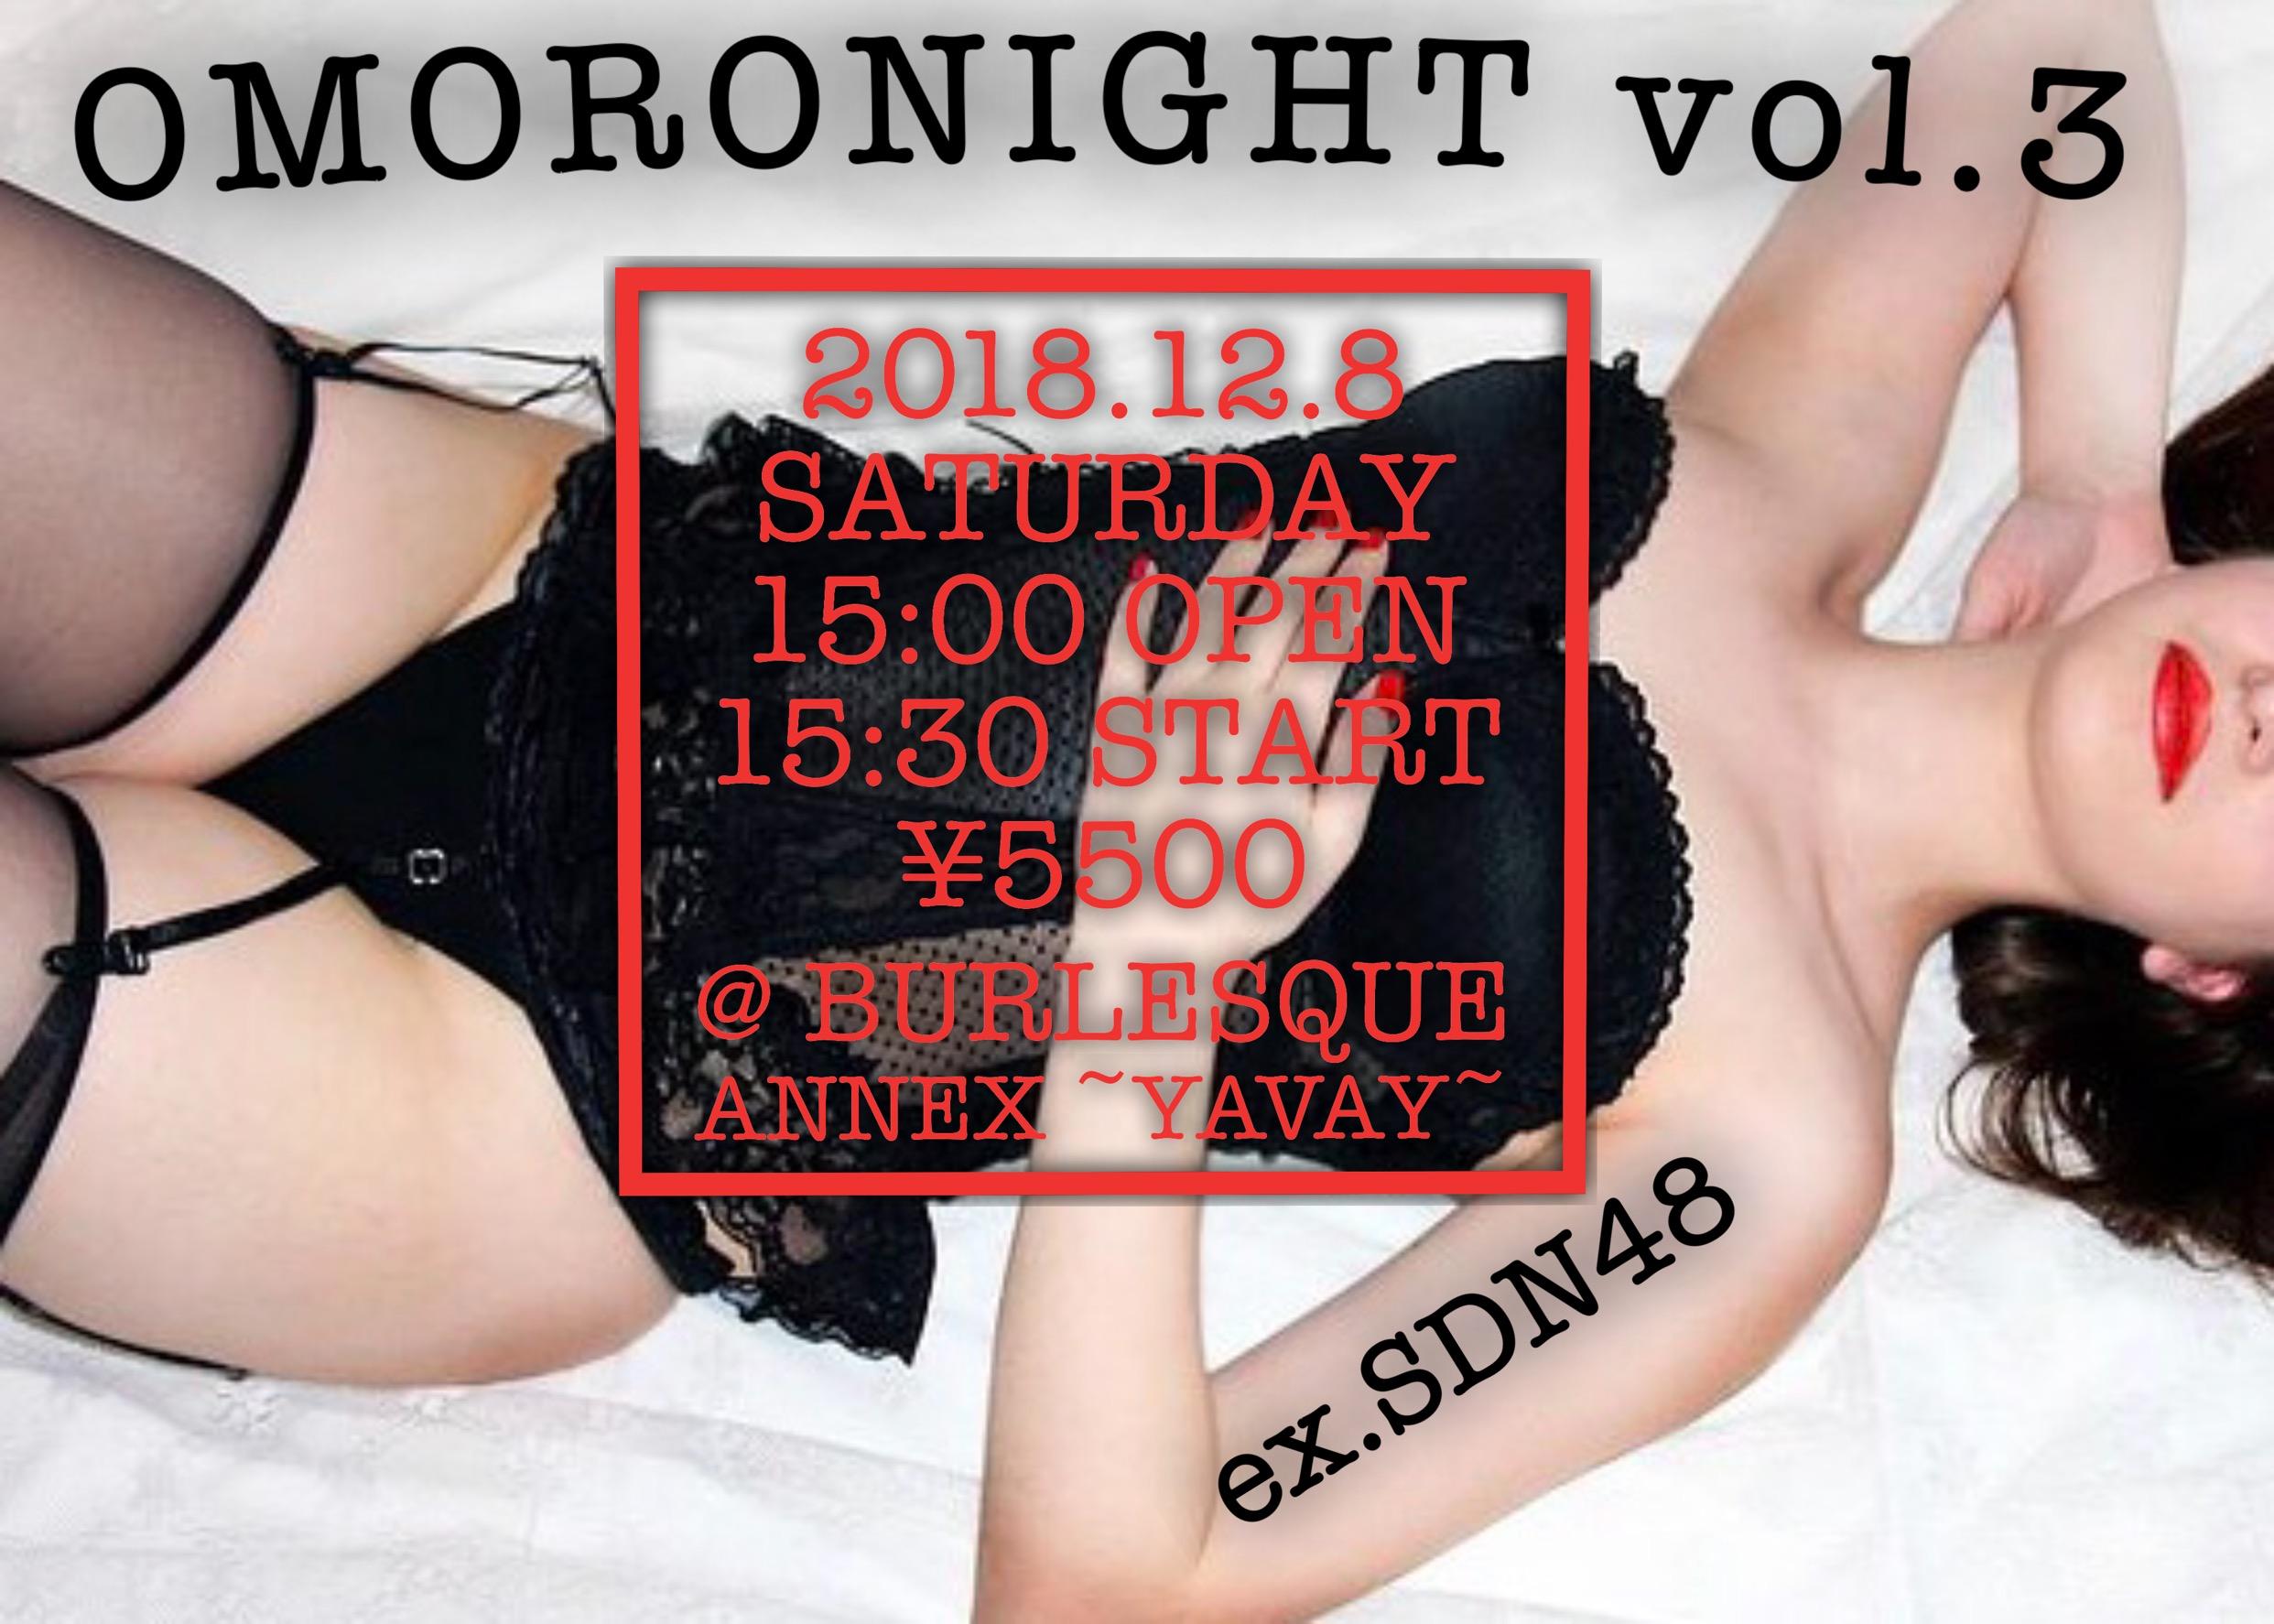 OMORO NIGHT!!〜Vol.3〜 光上せあら専用チケット購入ページ